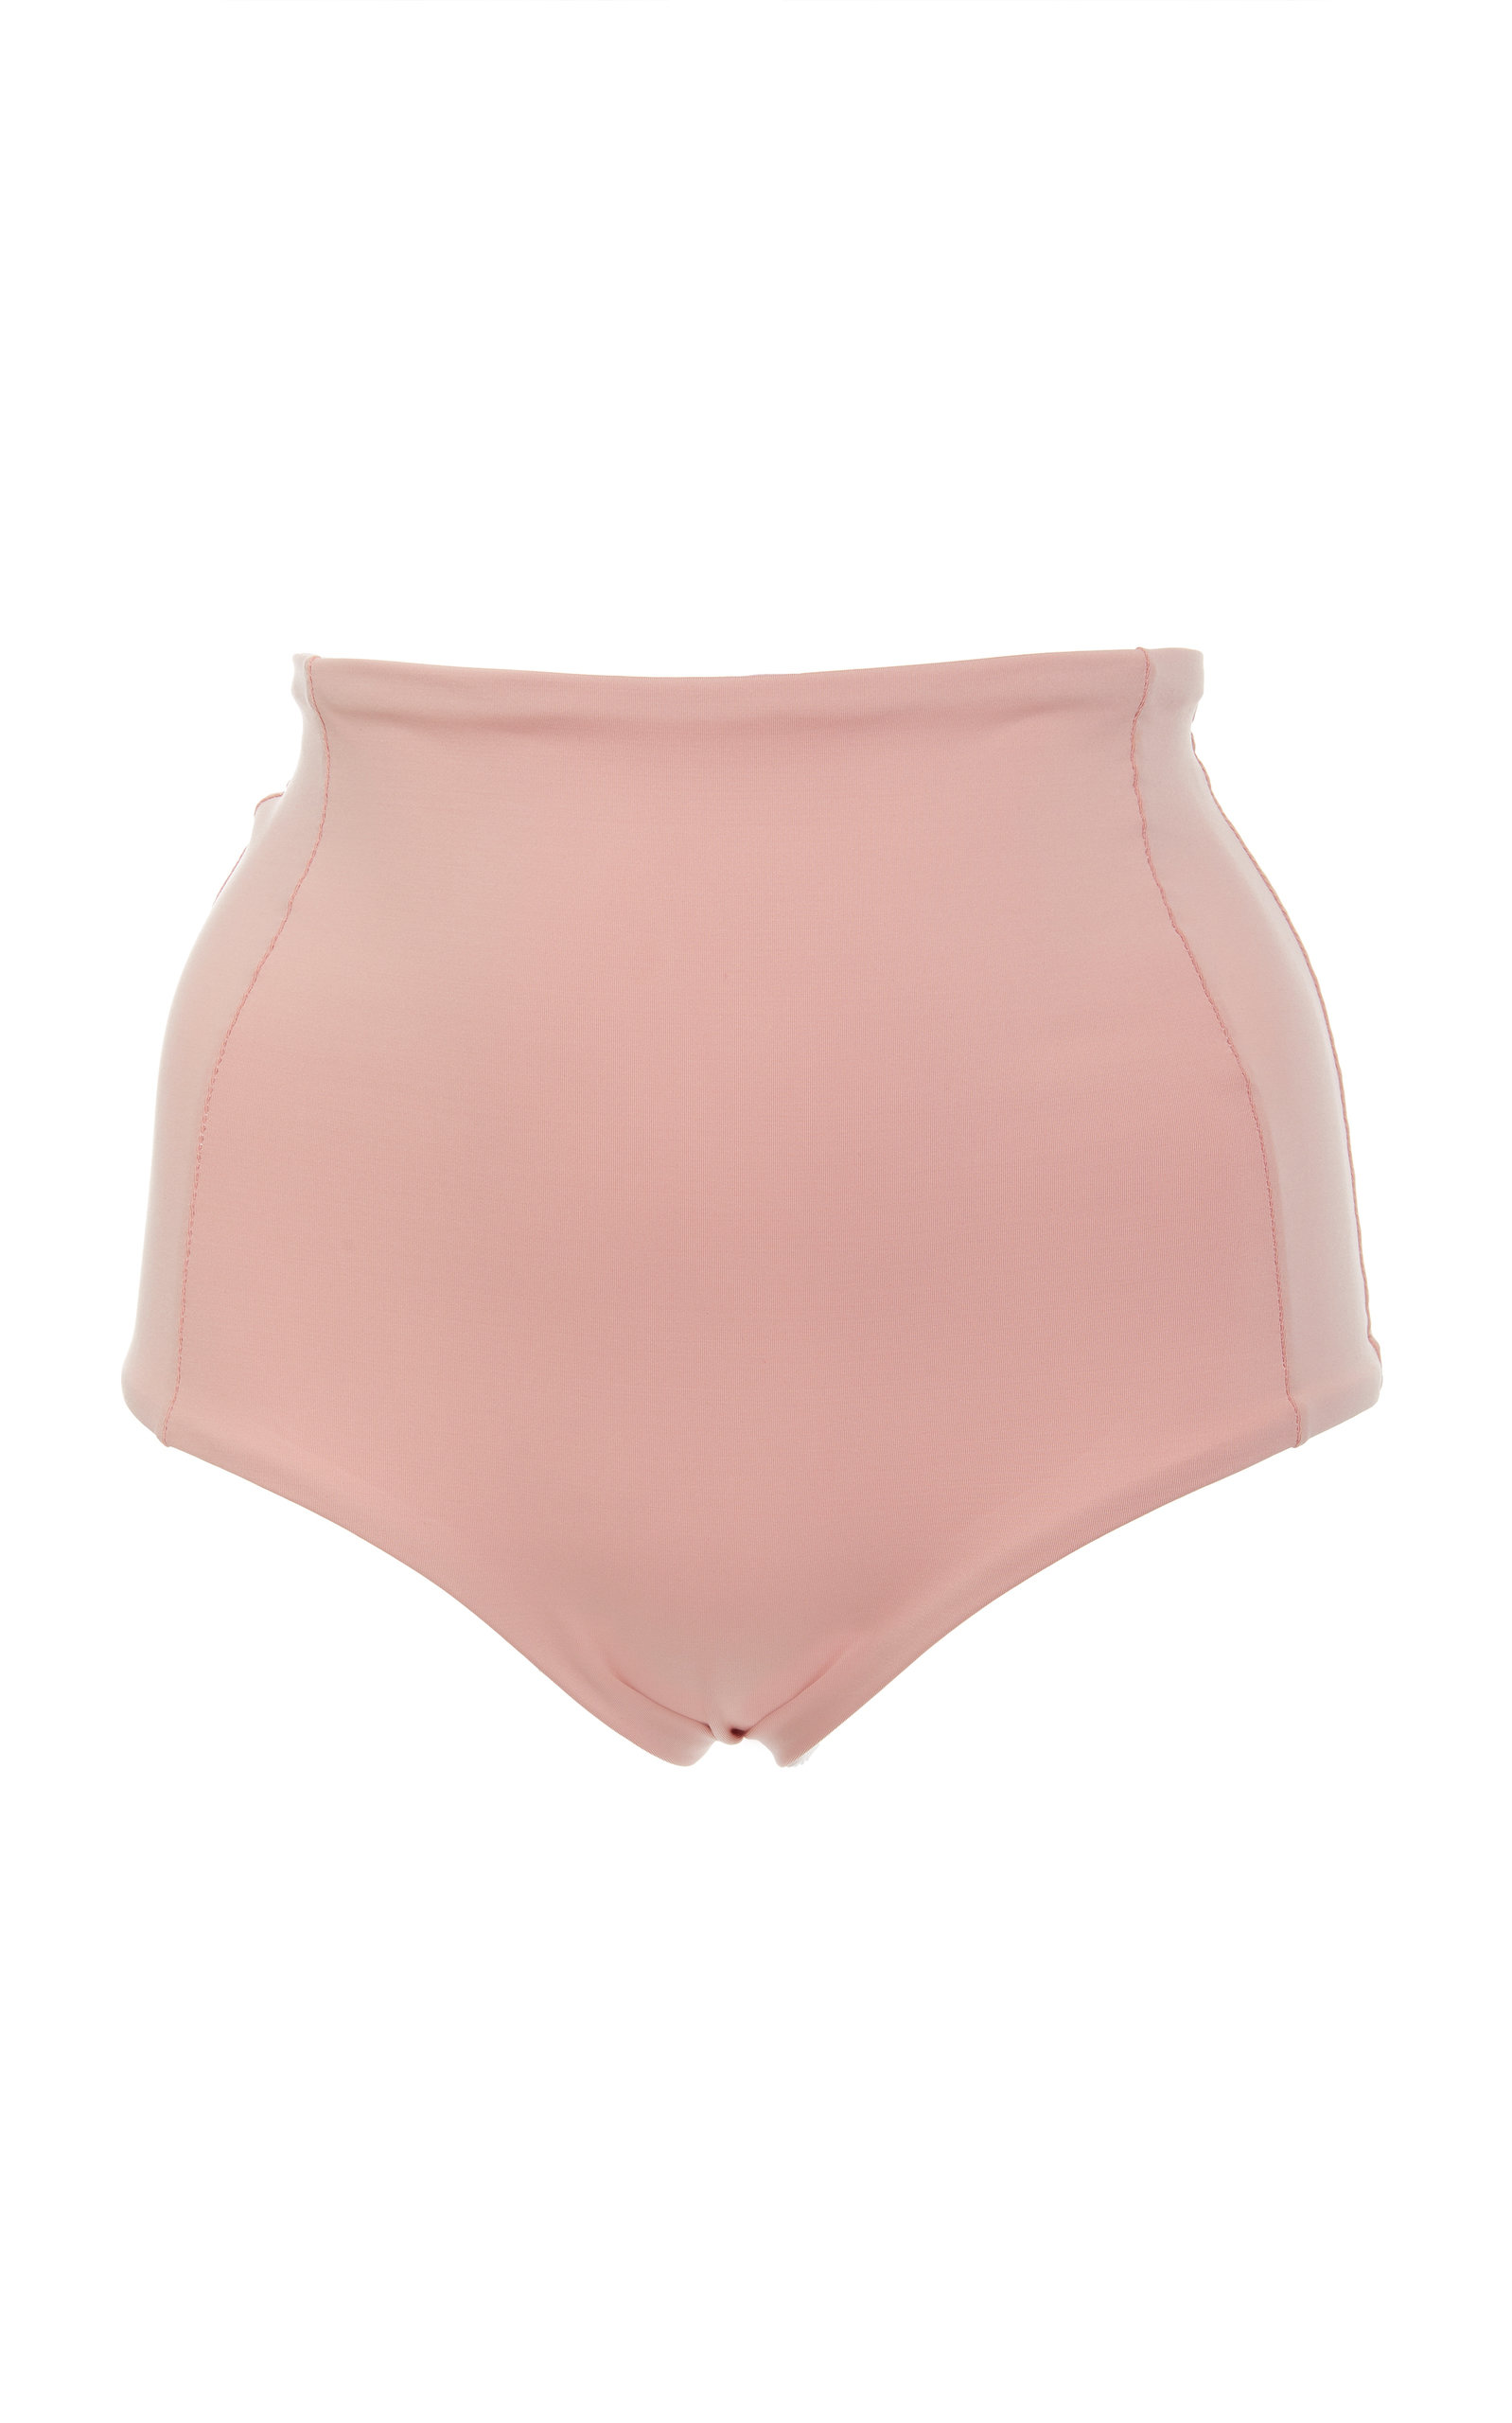 VERDELIMON Banes High Waisted Bikini Bottoms in Pink